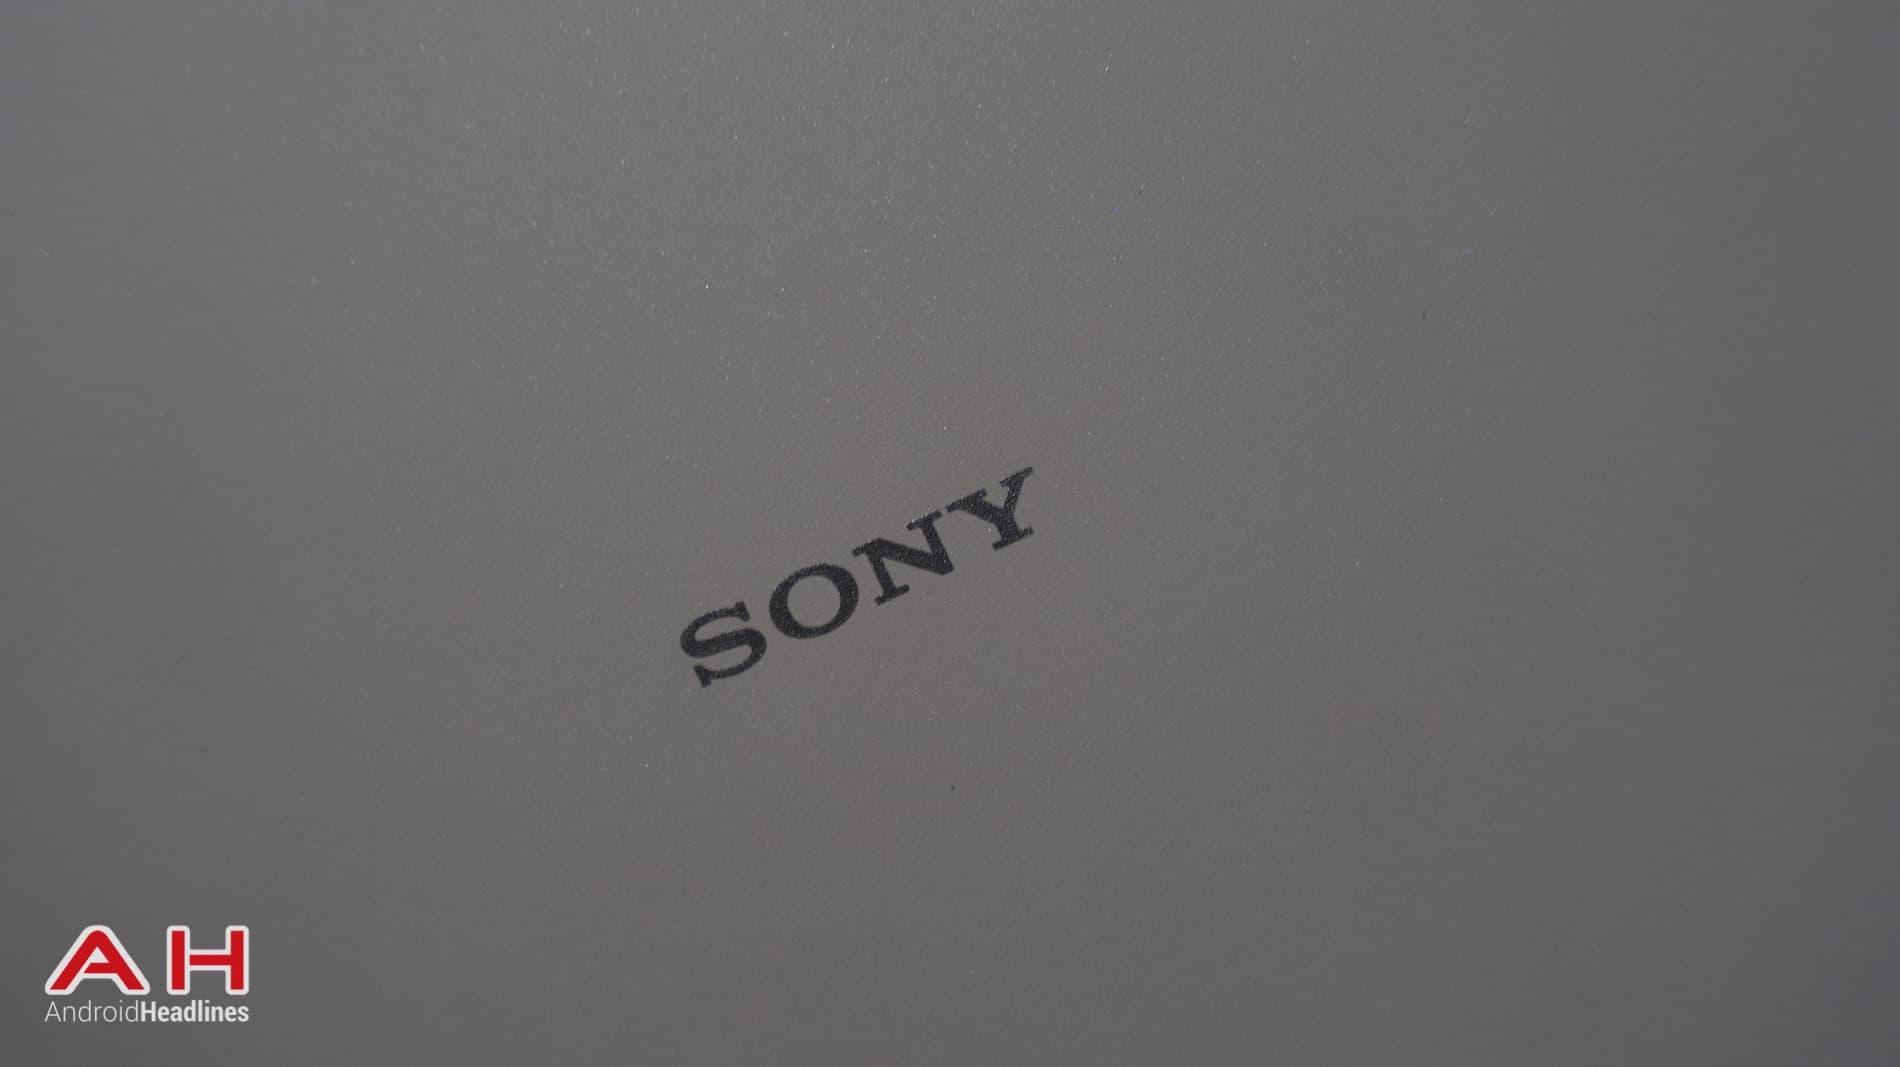 Sony Xperia Z4 Tablet AH 10